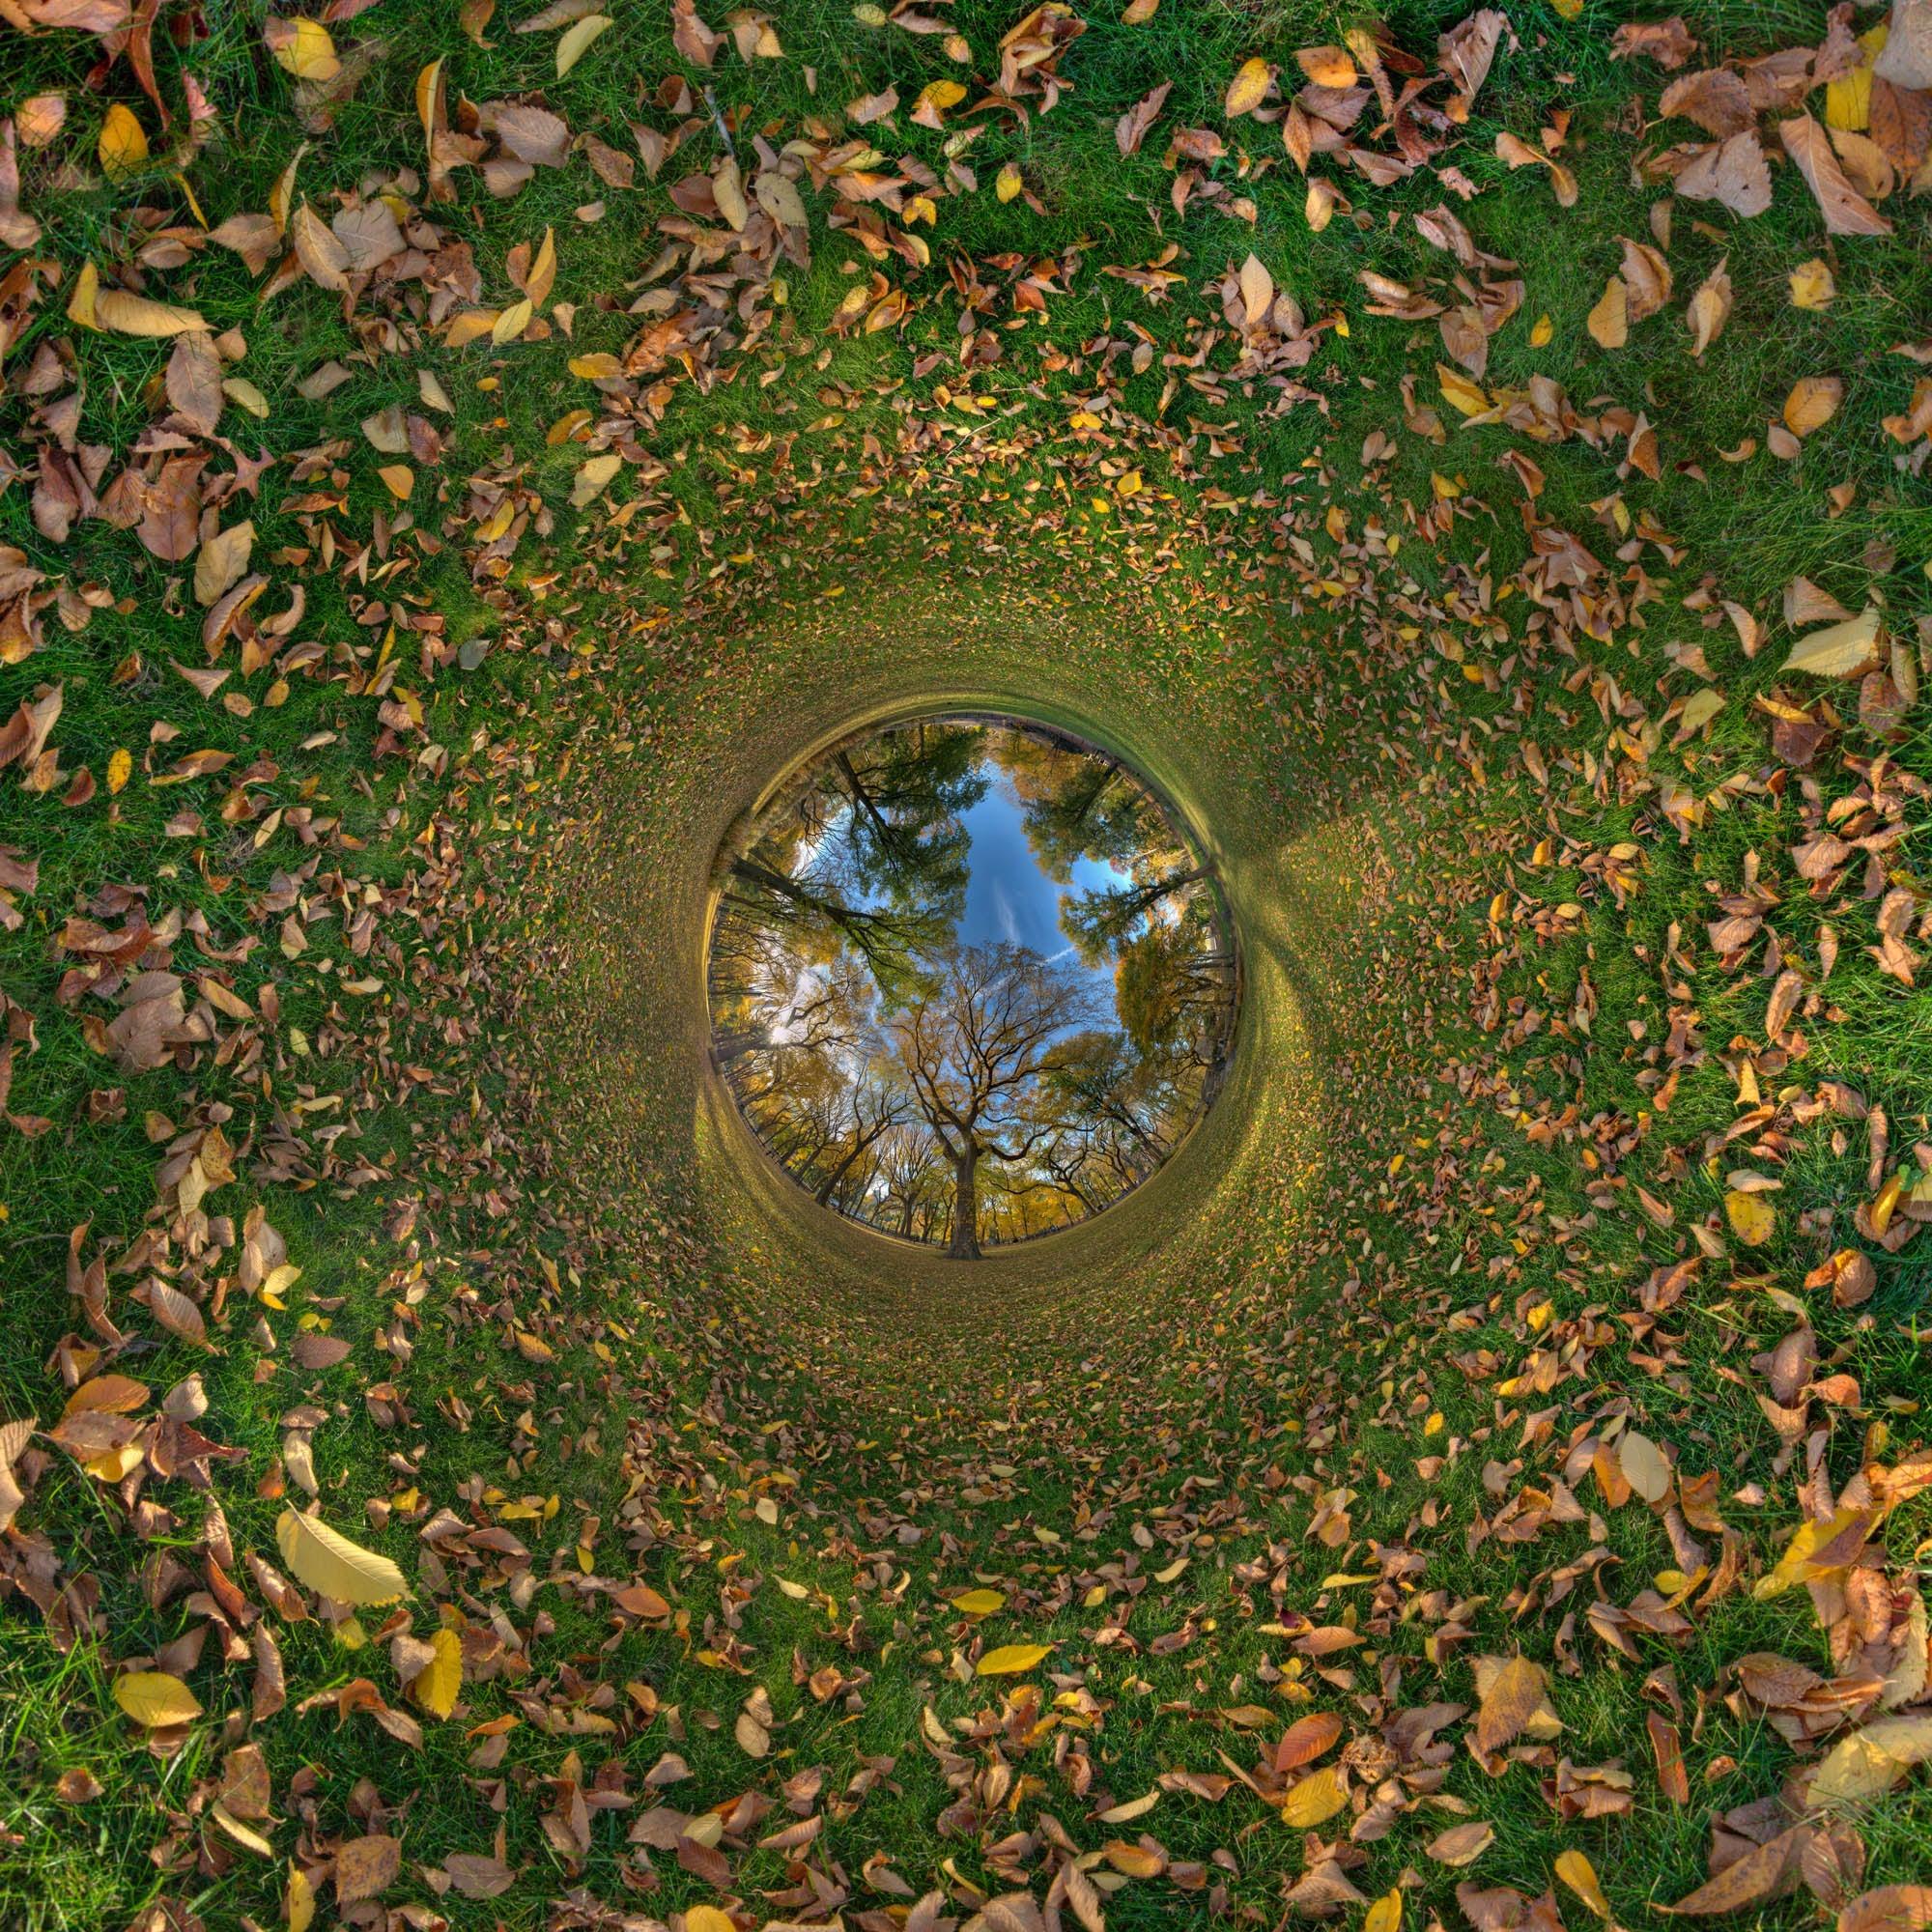 Photo wizard warps reality, invokes interdimensional wormholes on Earth